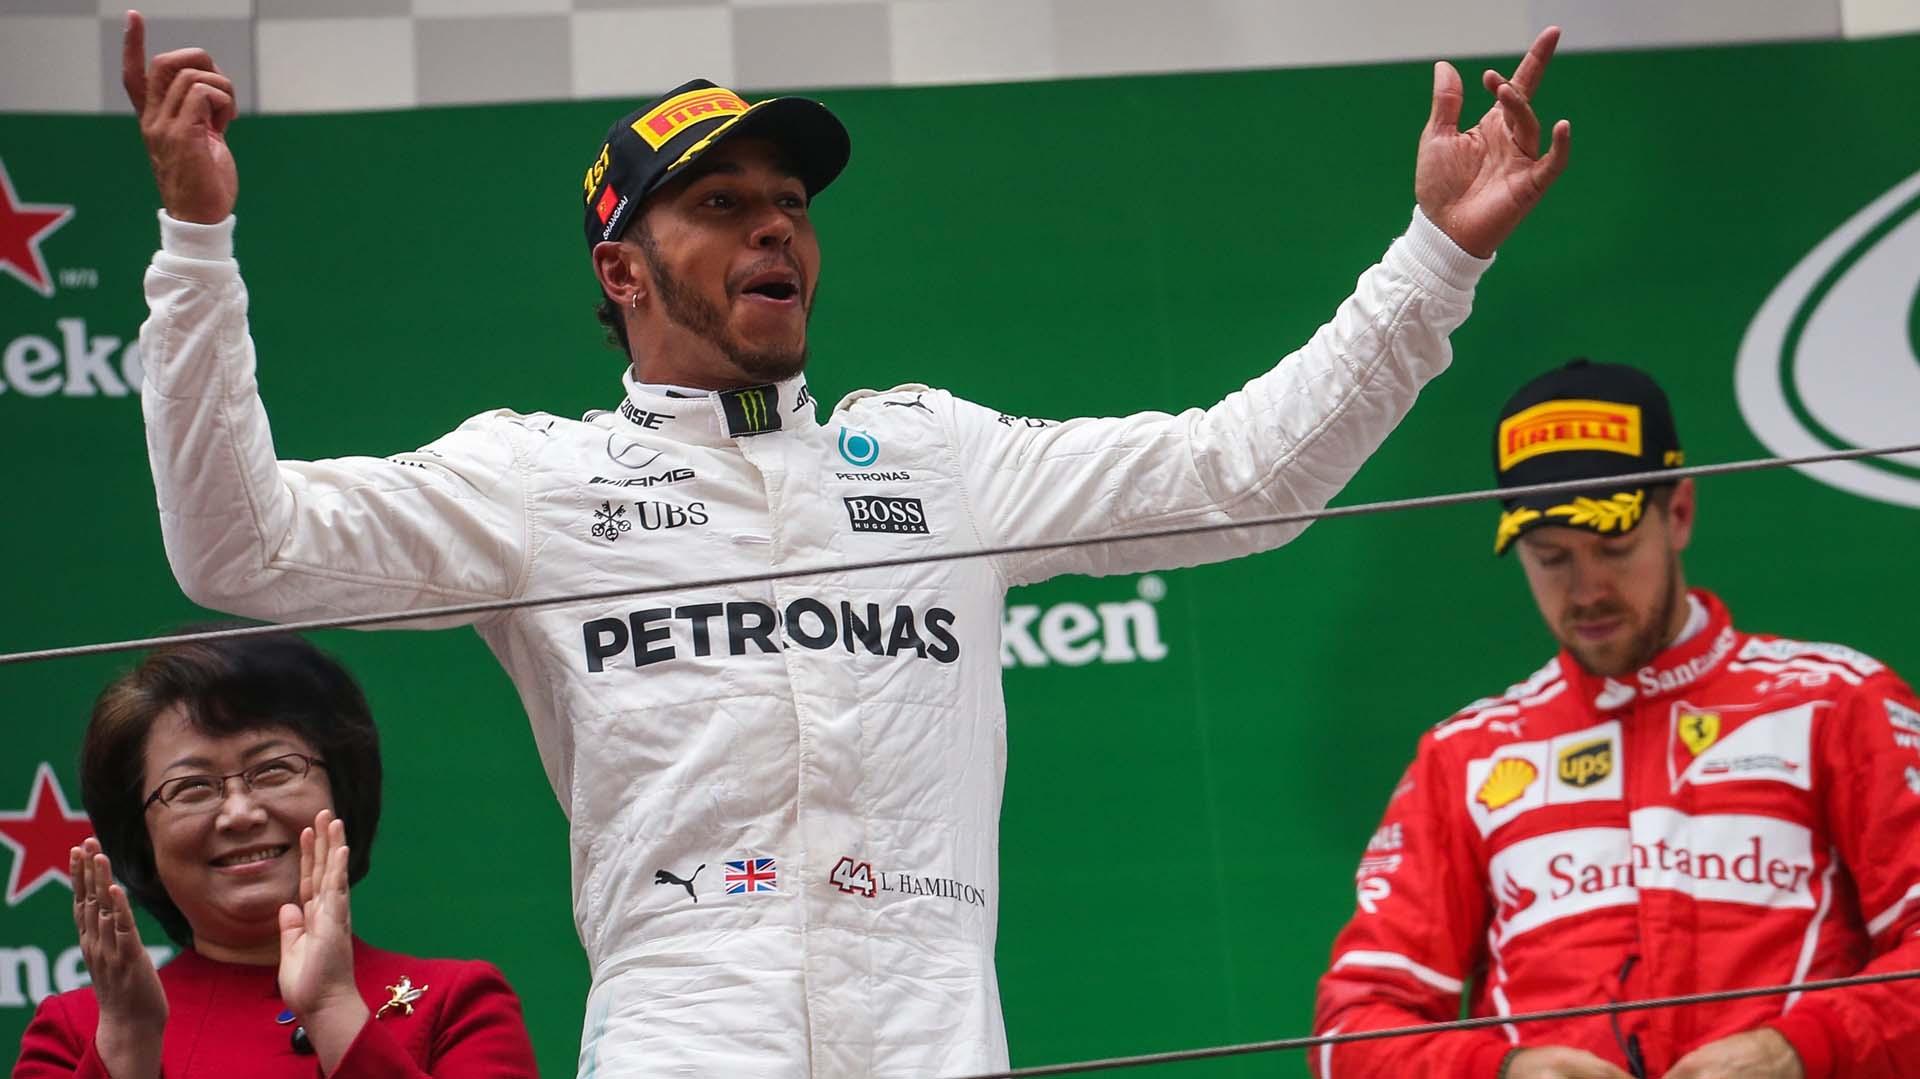 Lewis Hamilton (EFE/EPA/ROMAN PILIPEY)